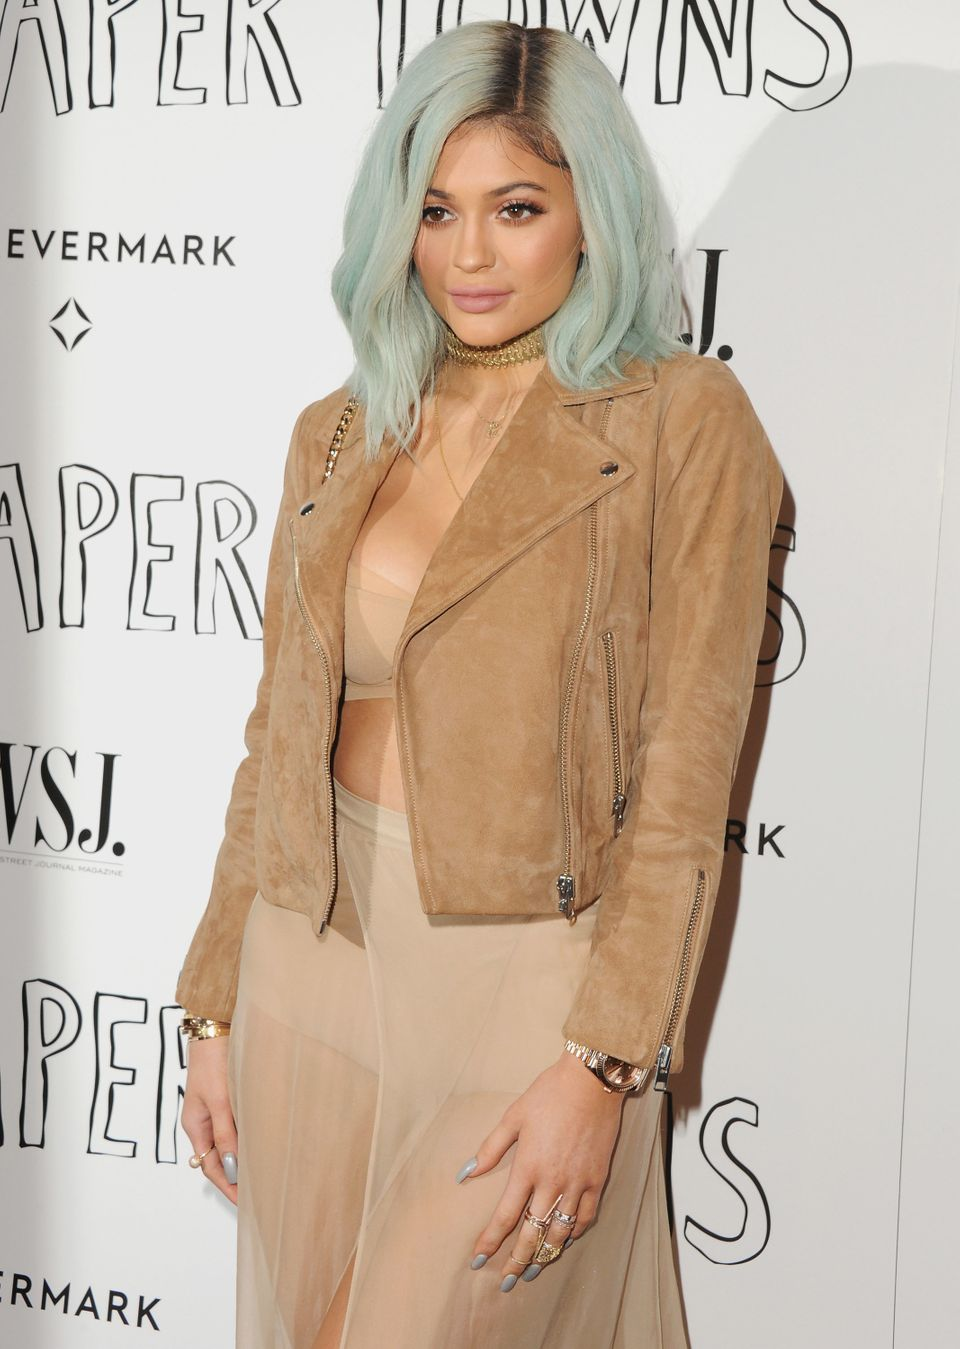 5d8e06cb03f44 47 Photos Of Kylie Jenner's Evolution As A Beauty Trendsetter ...